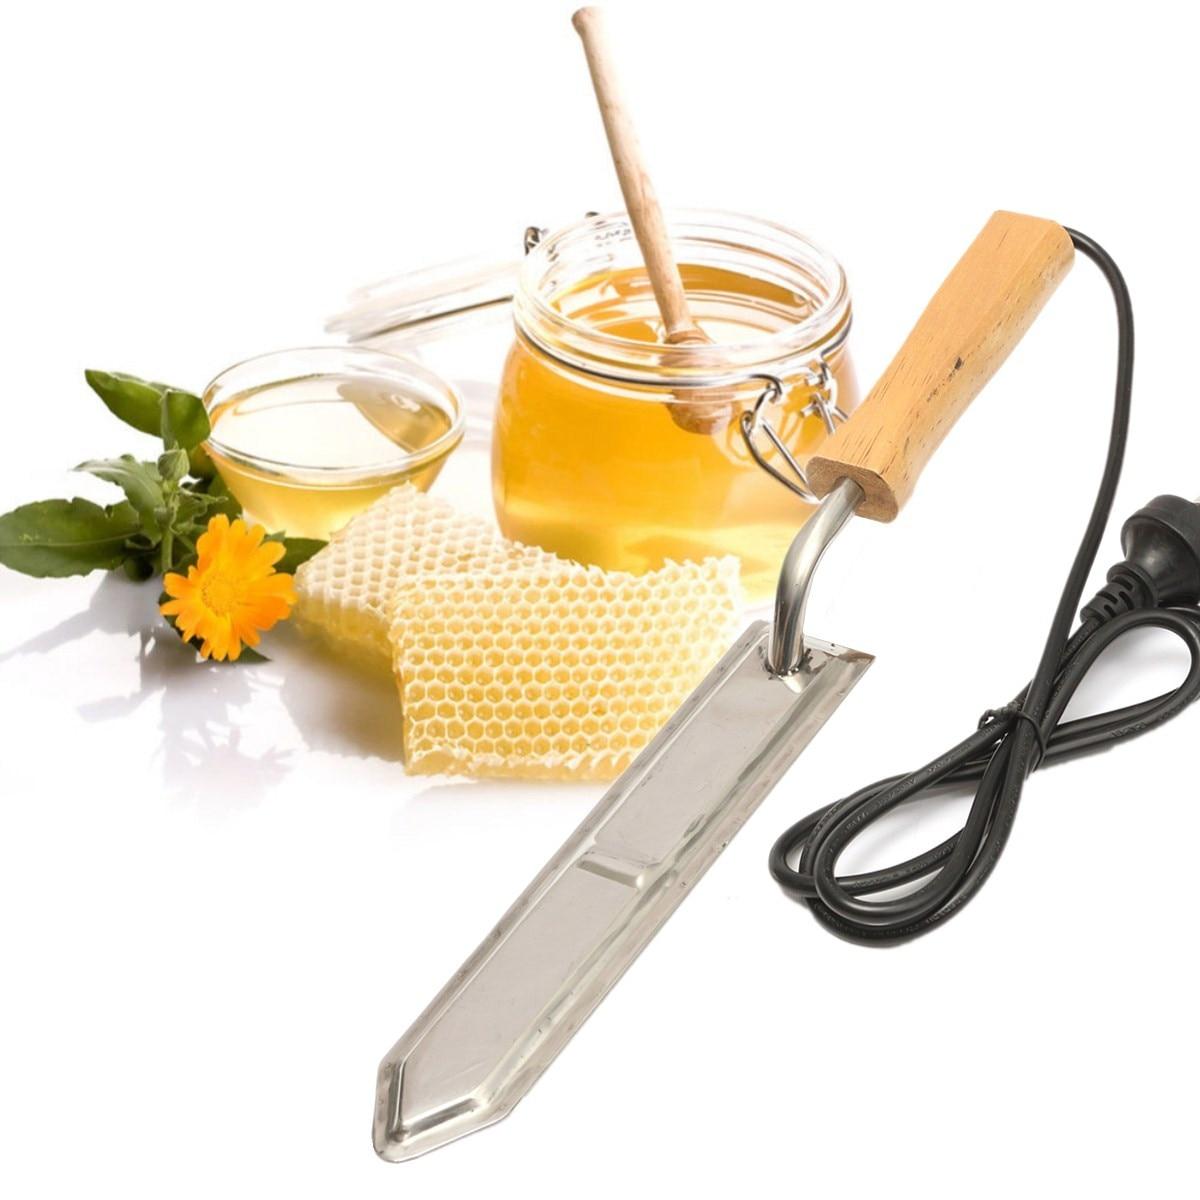 Electric Uncapping Cutter Honey Scraper Extractor Beekeeper Tool Stainless Steel 43 x 5.5cm AU Plug Garden Beekeeping Tools